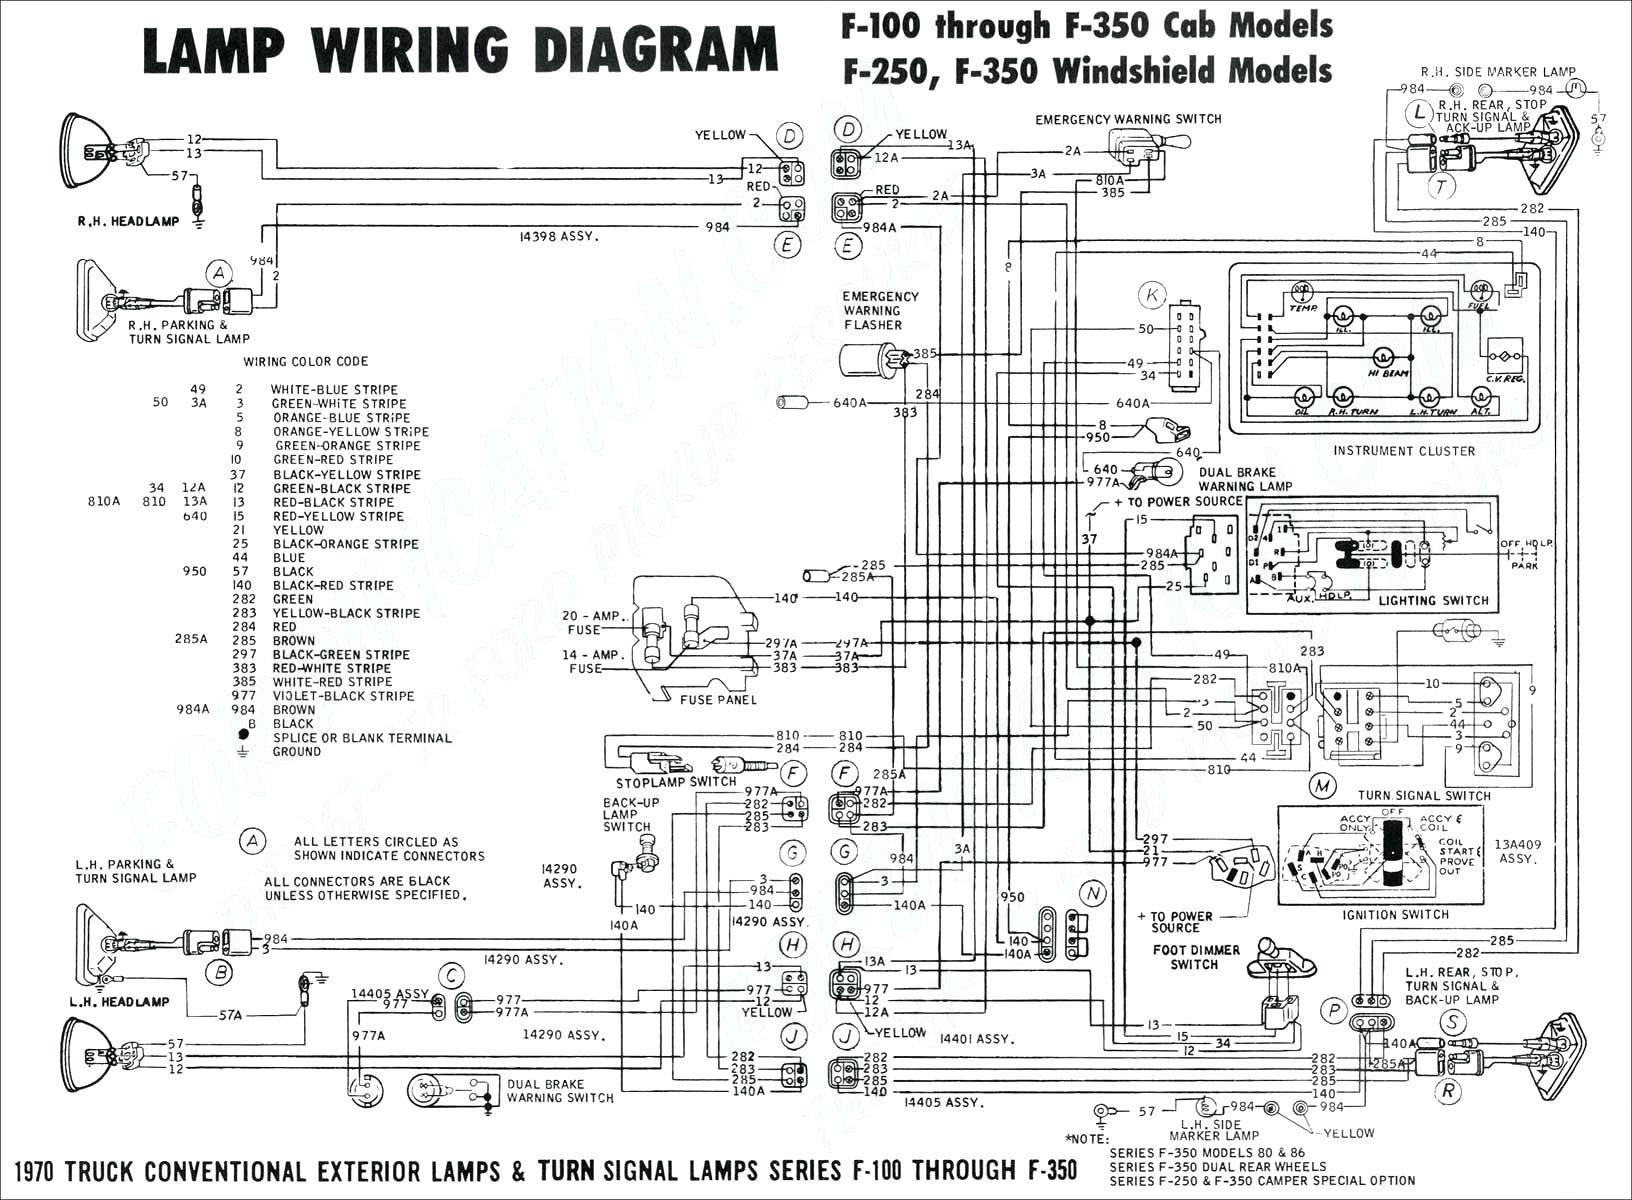 Honda Lawn Mower Parts Diagram Wiring Diagram Sears Ss14 Layout Wiring Diagrams • Of Honda Lawn Mower Parts Diagram